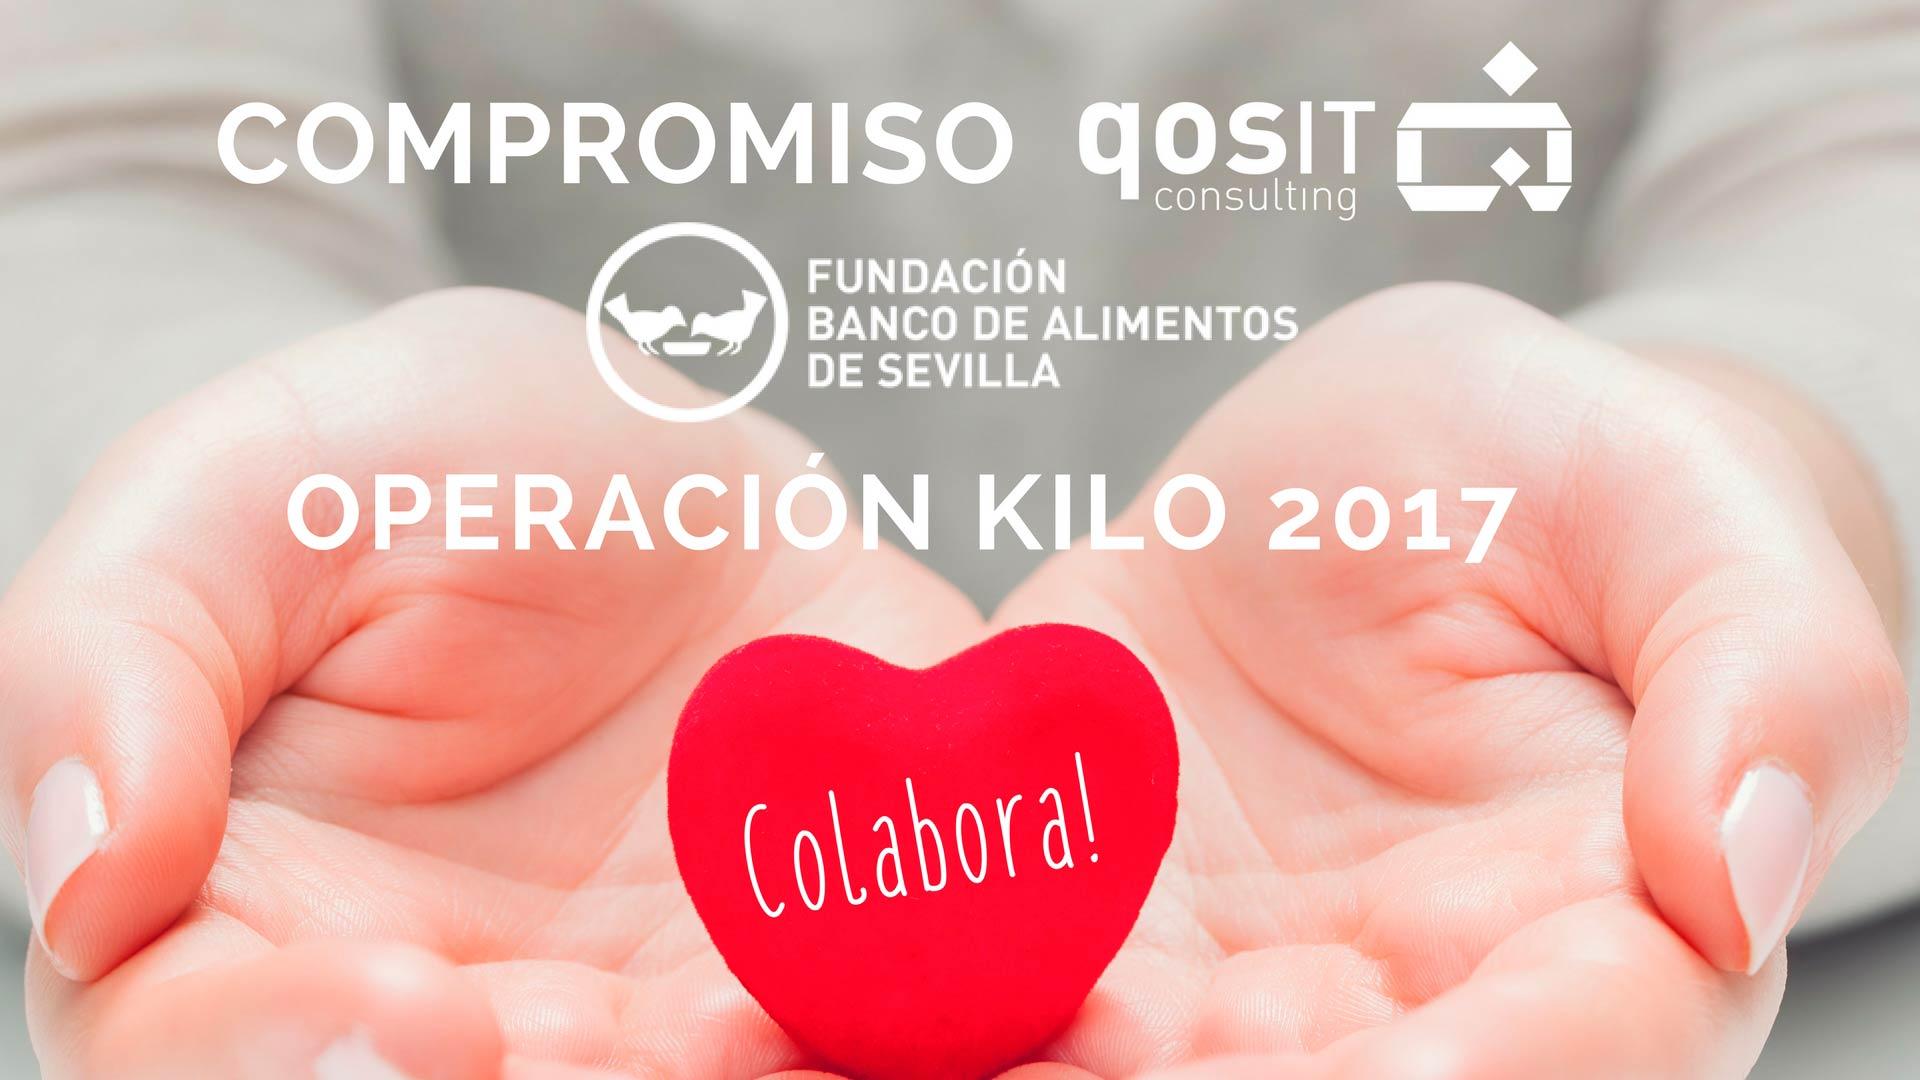 Operación Kilo 2017